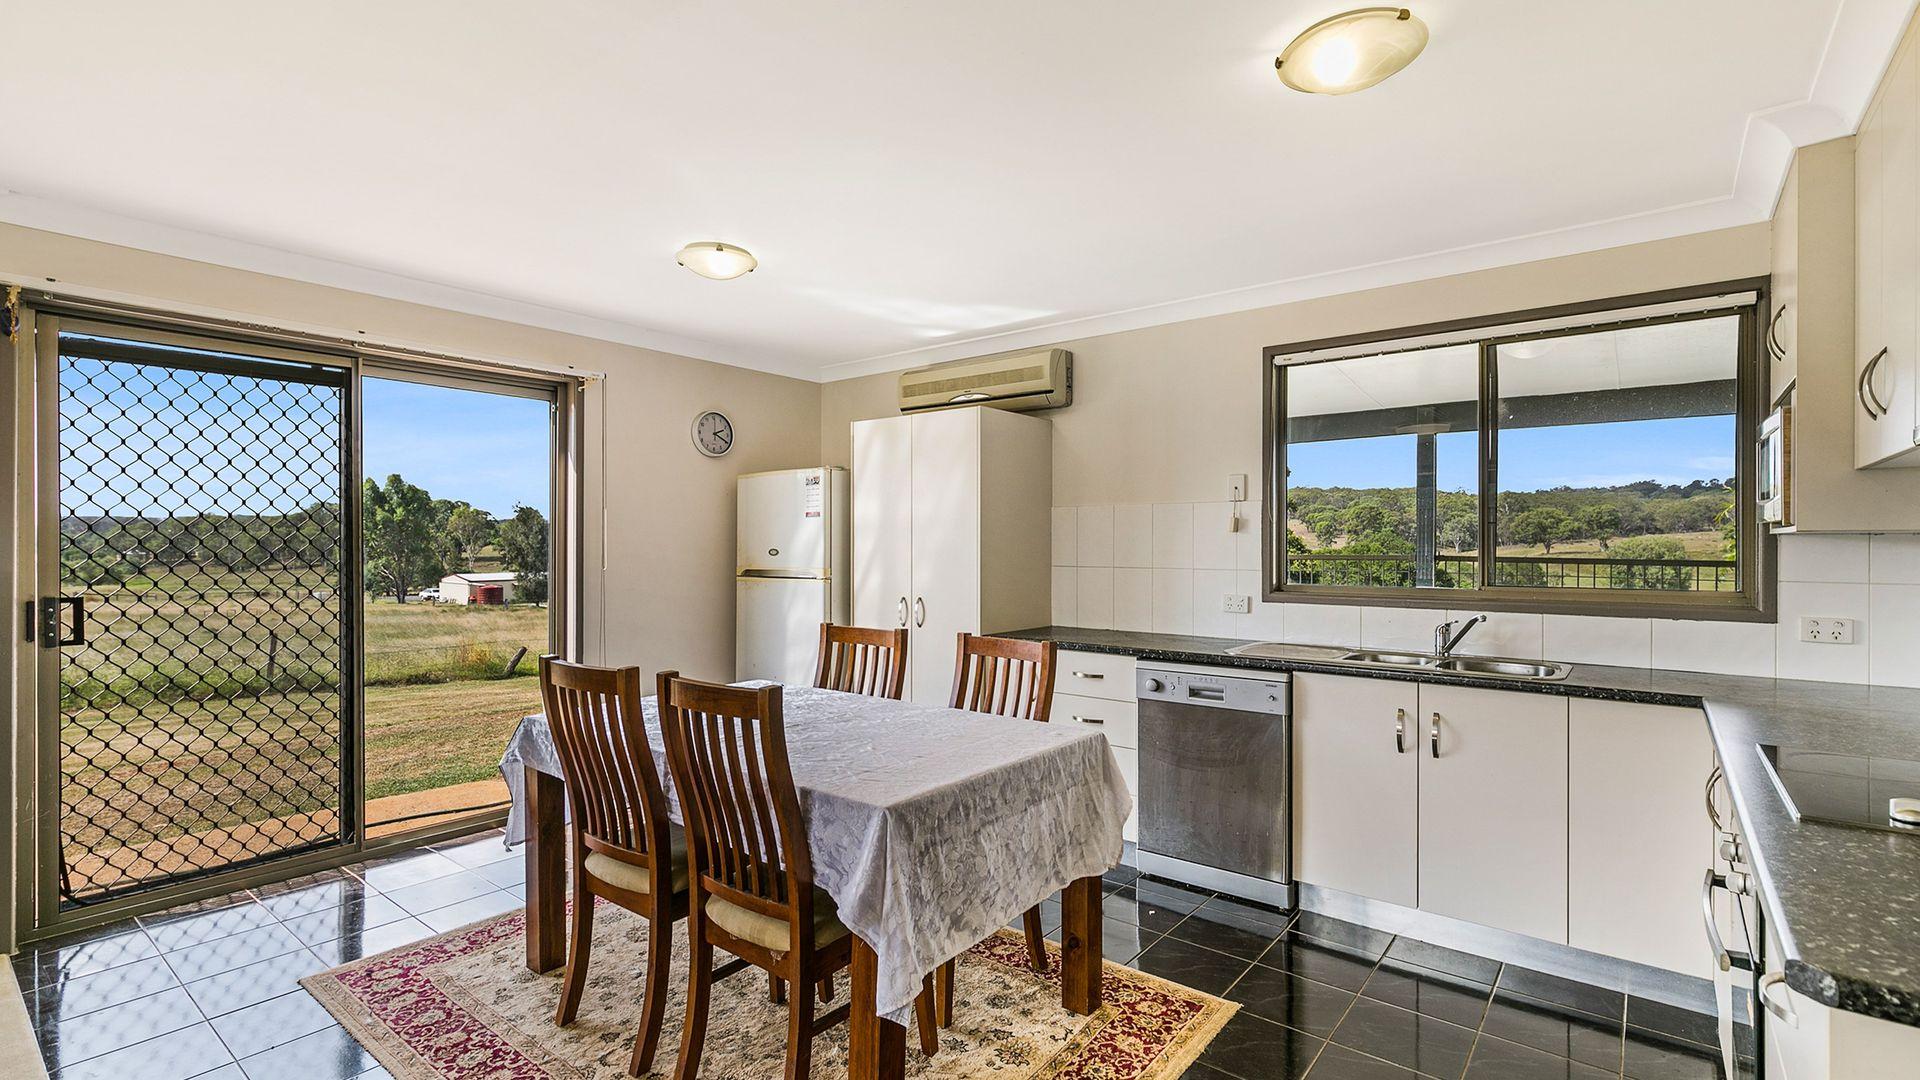 76 Willis Road, Meringandan West QLD 4352, Image 1